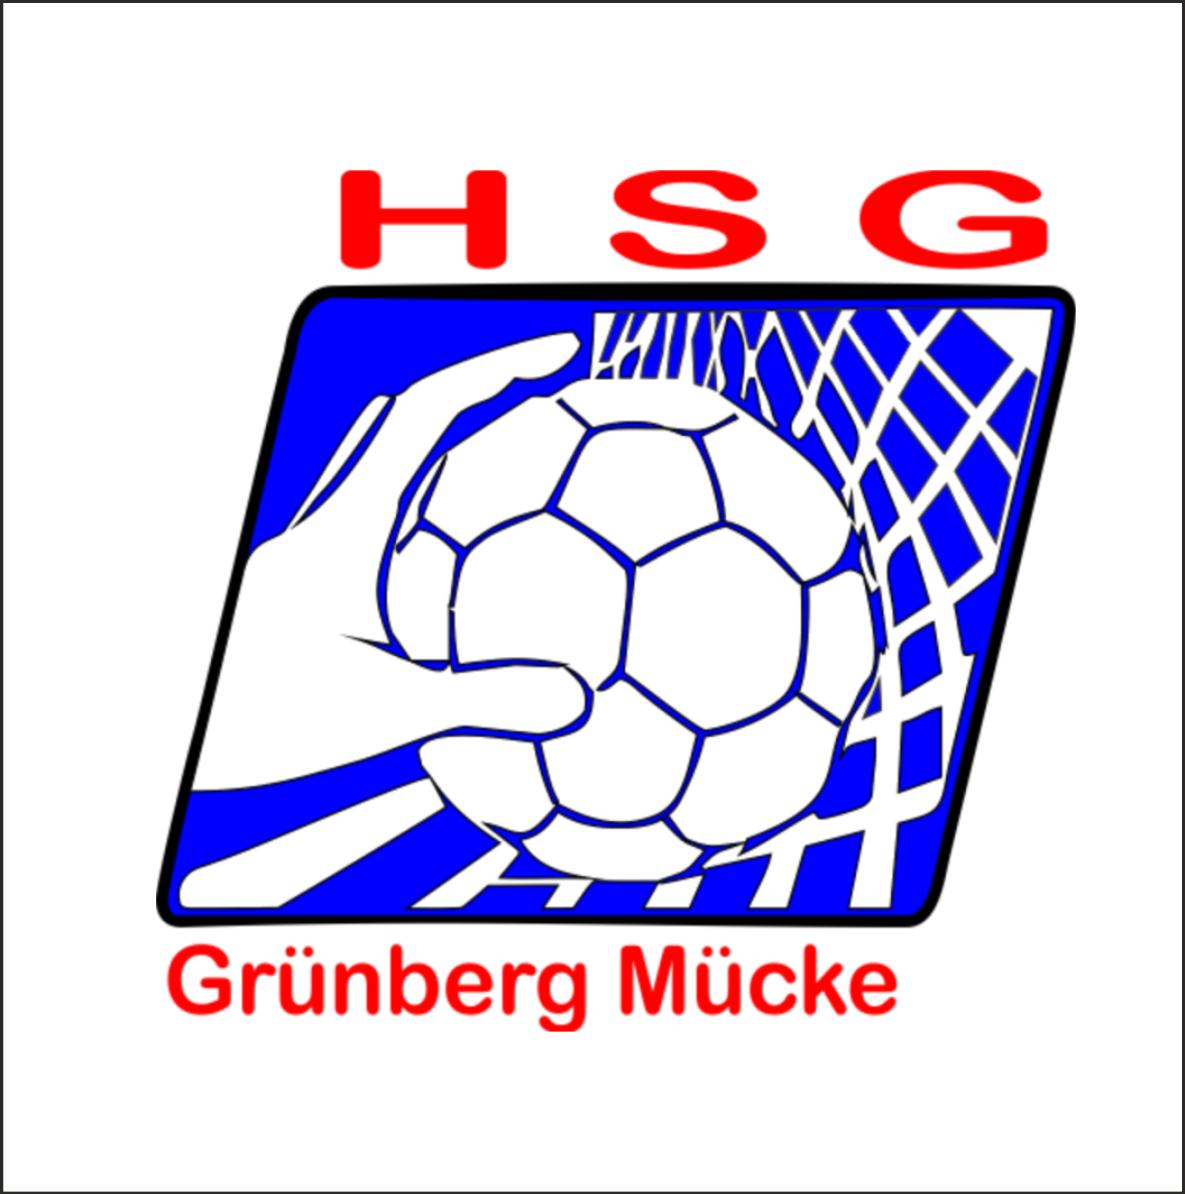 HSG Grünberg-Mücke